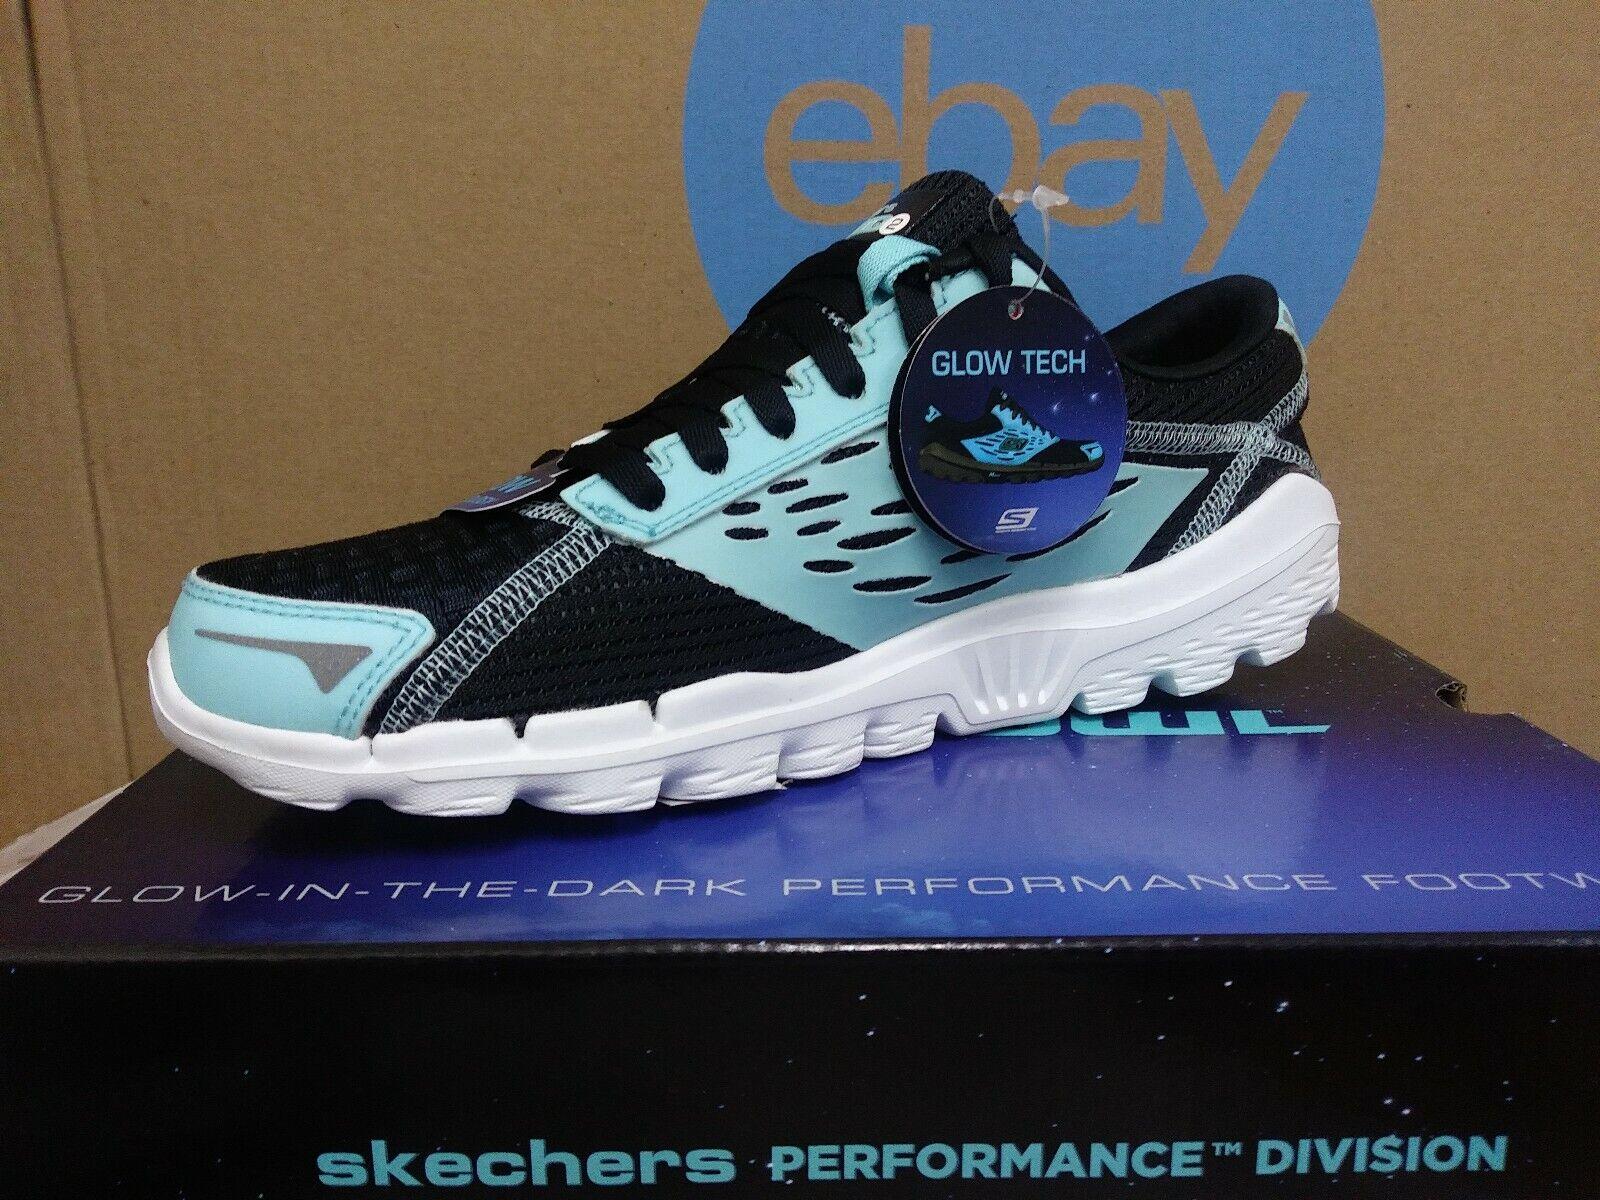 NIB Nuovi Skchers Rari OWL Men Running scarpe Dimensione 7  nero Aqua Glow in the Dark E3  punto vendita